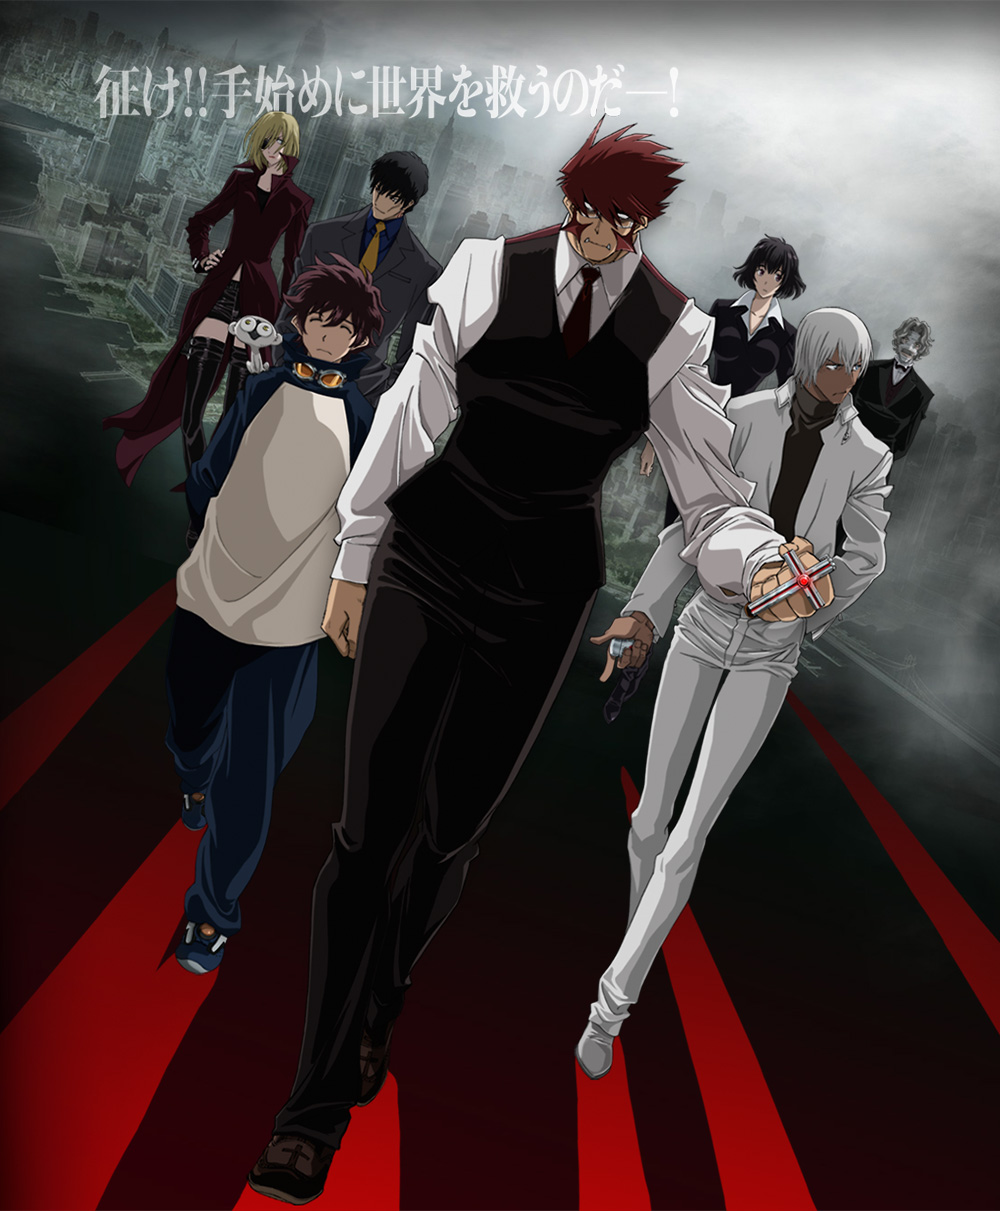 Kekkai-Sensen_Haruhichan.com-Anime-Visual-2